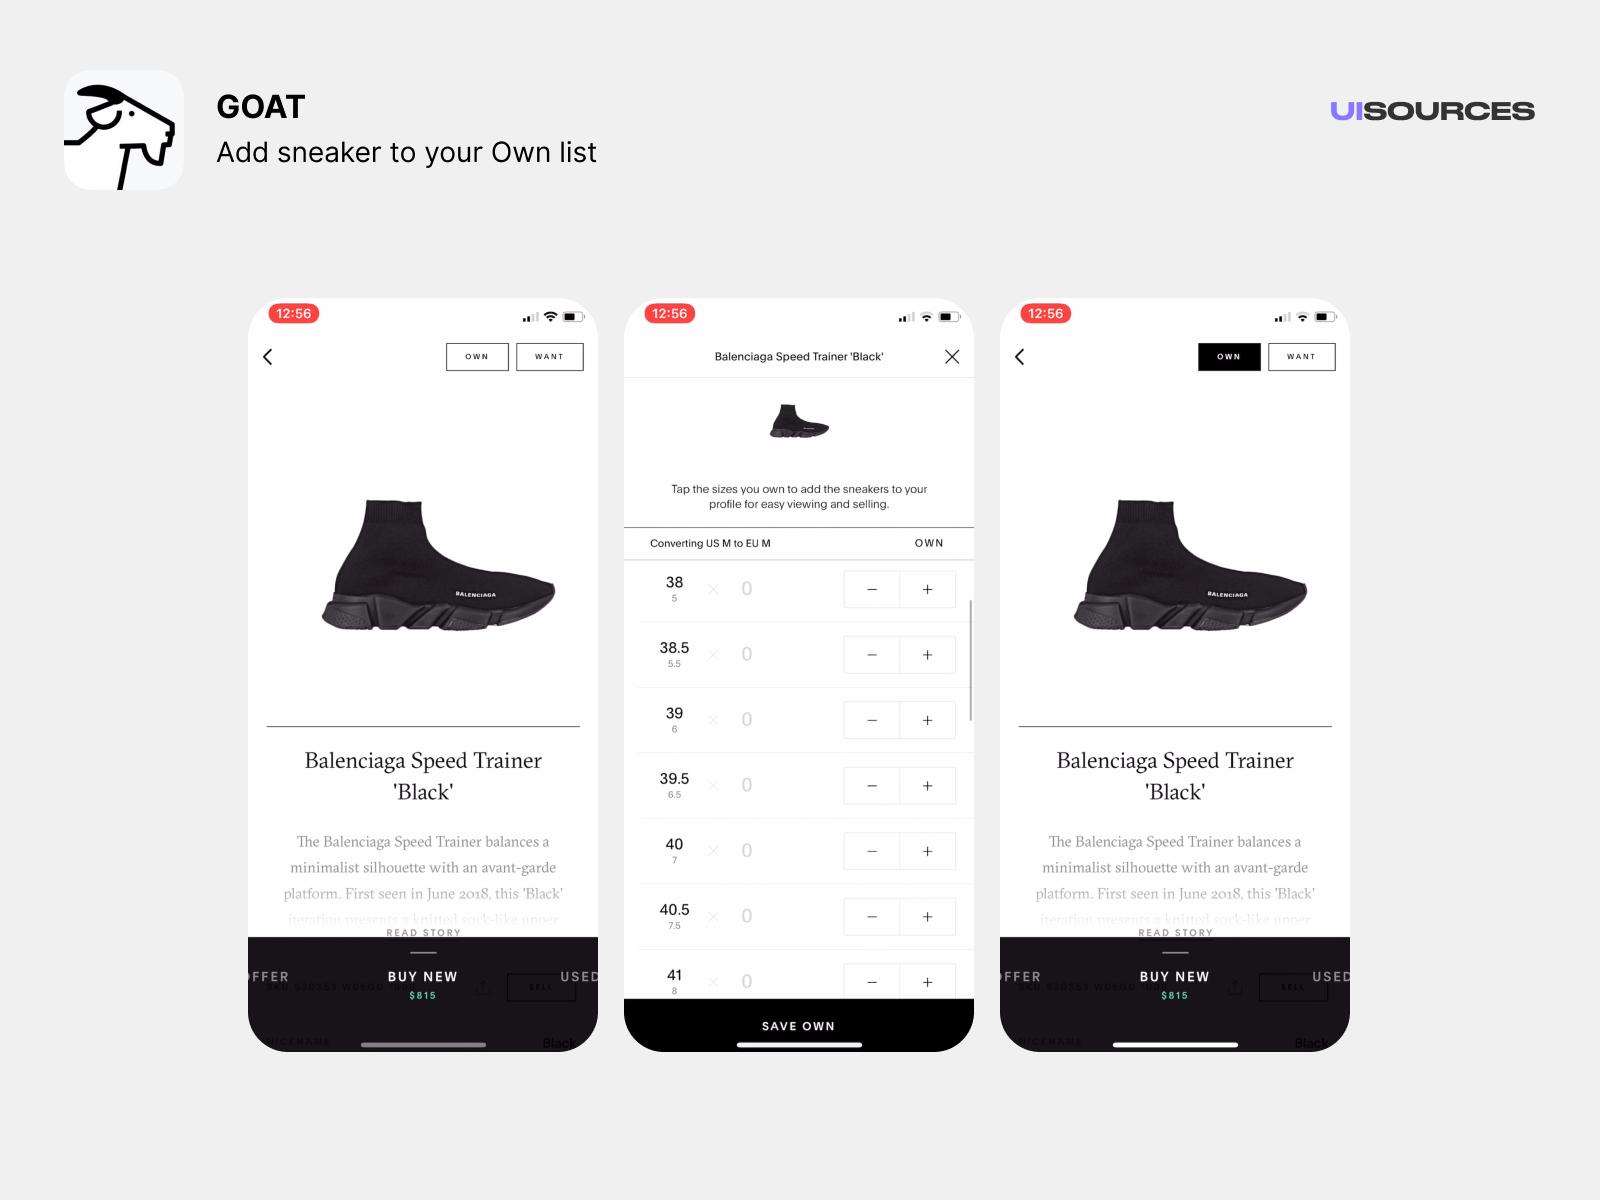 Add sneaker To Own list